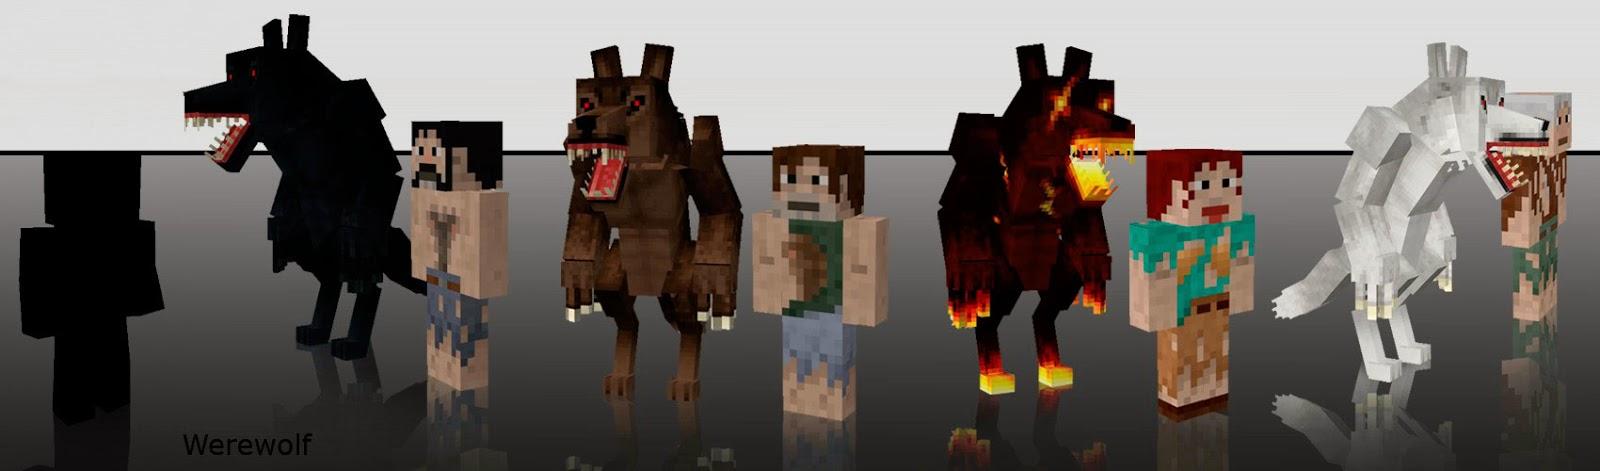 Mo' Creatures hombres lobo Minecraft mod